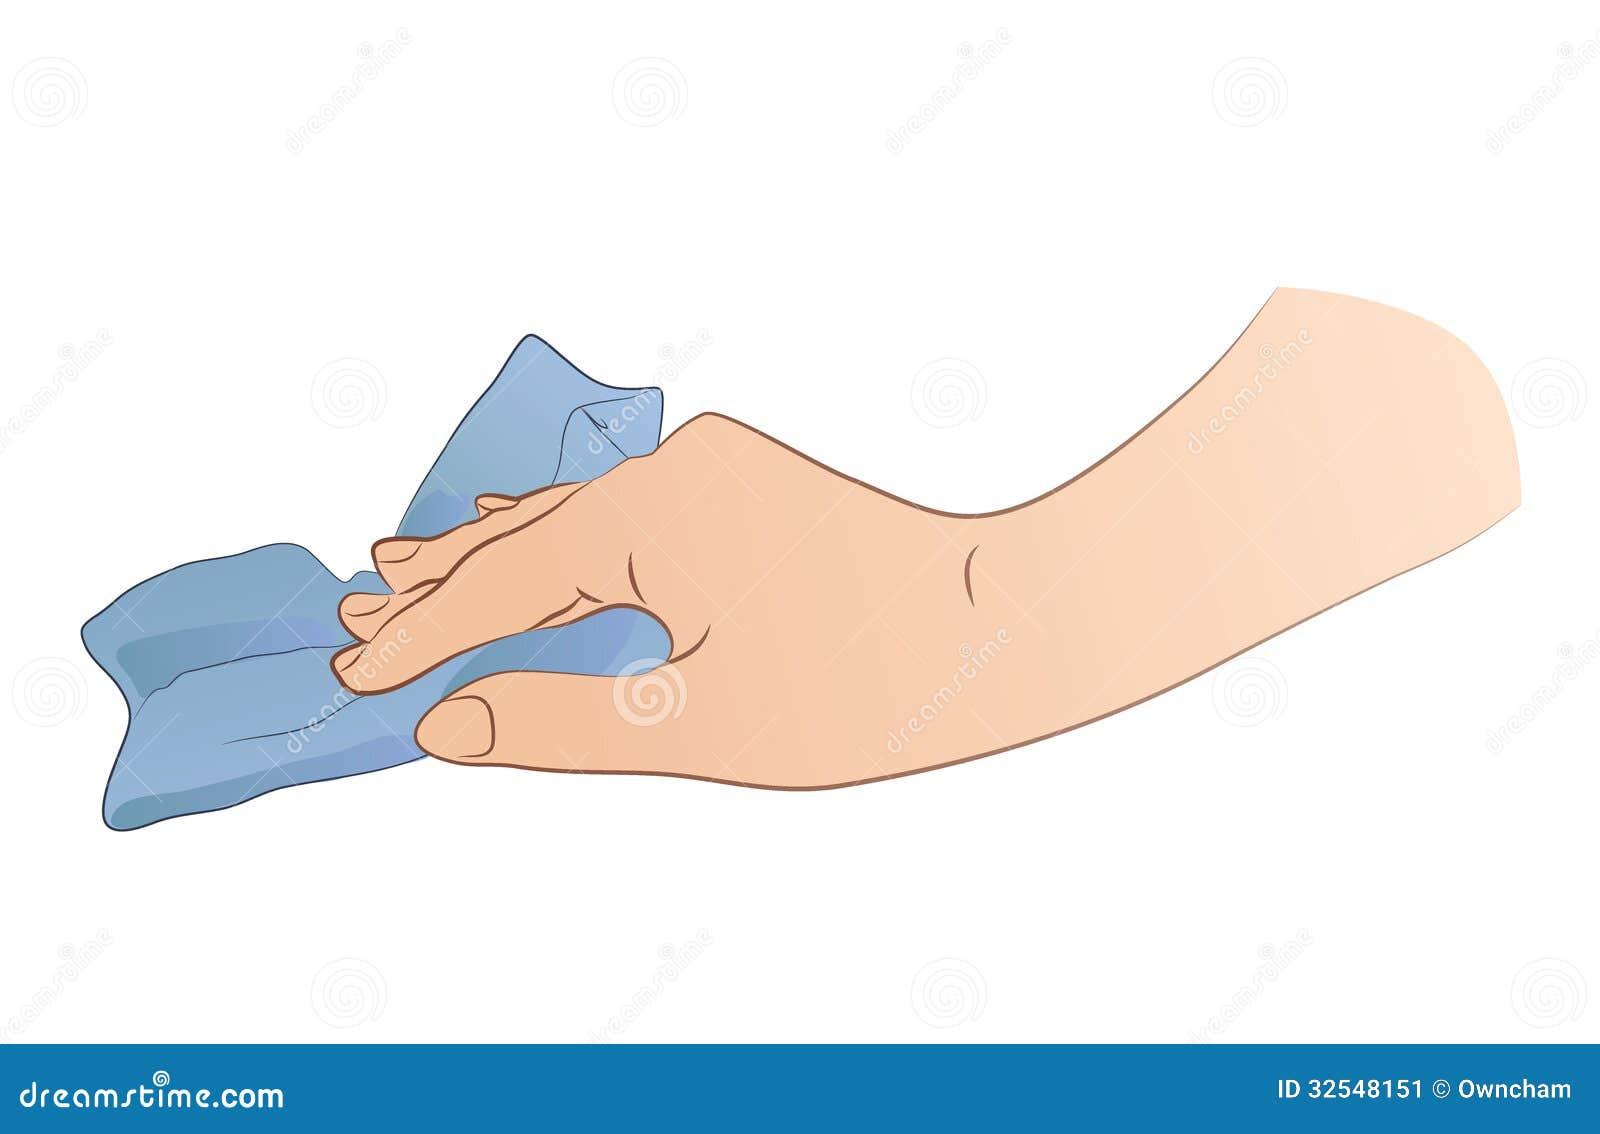 Dirty Rag Clipart Hand Holding Rag Stock...